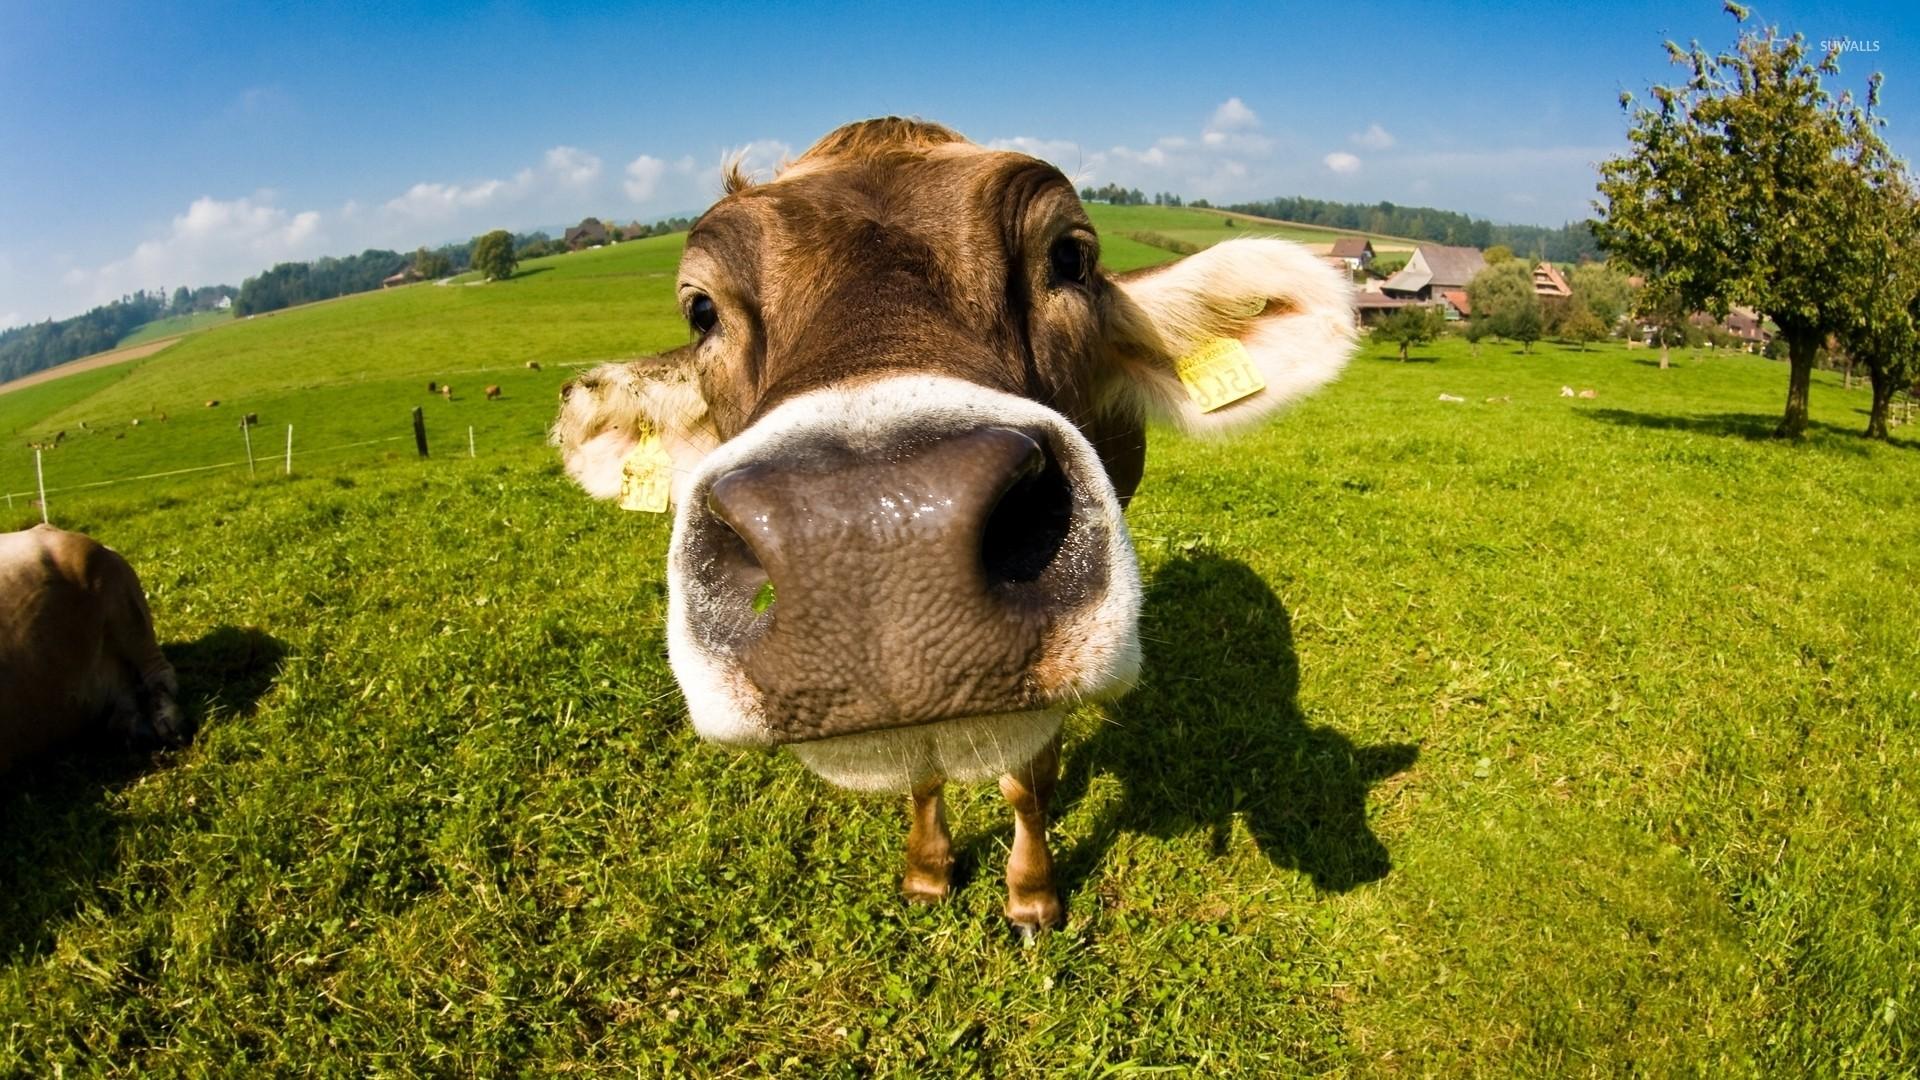 1920x1080, Cow Wallpaper   Data Id 268901   Data Src - Hd Cow - HD Wallpaper